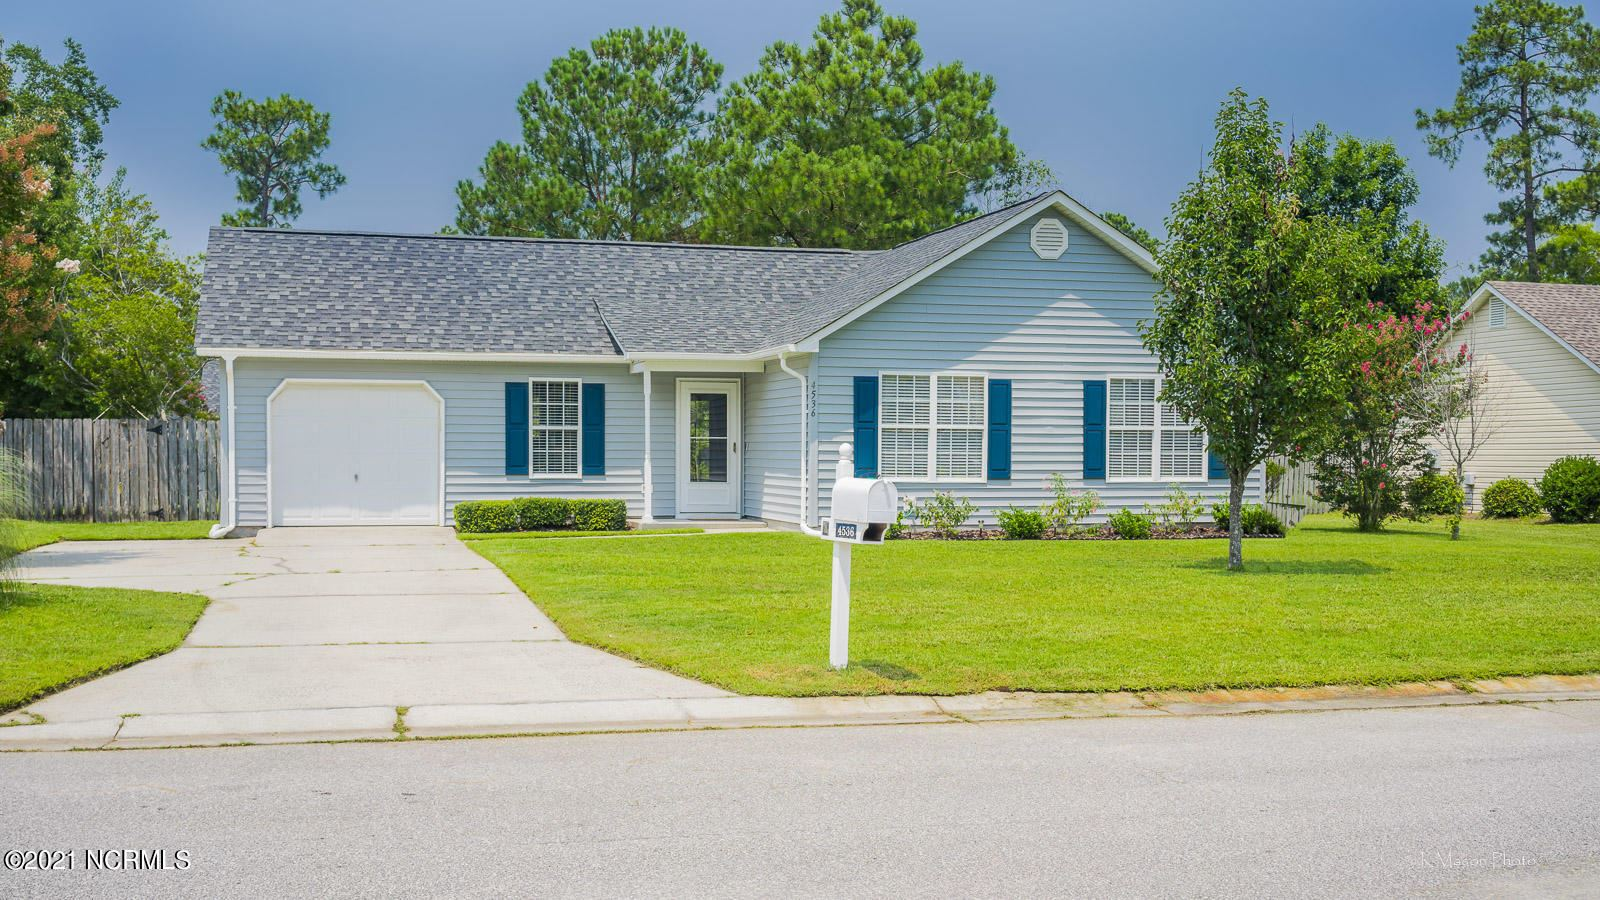 Photo for 4536 Alder Ridge Road, Wilmington, NC 28412 (MLS # 100281830)